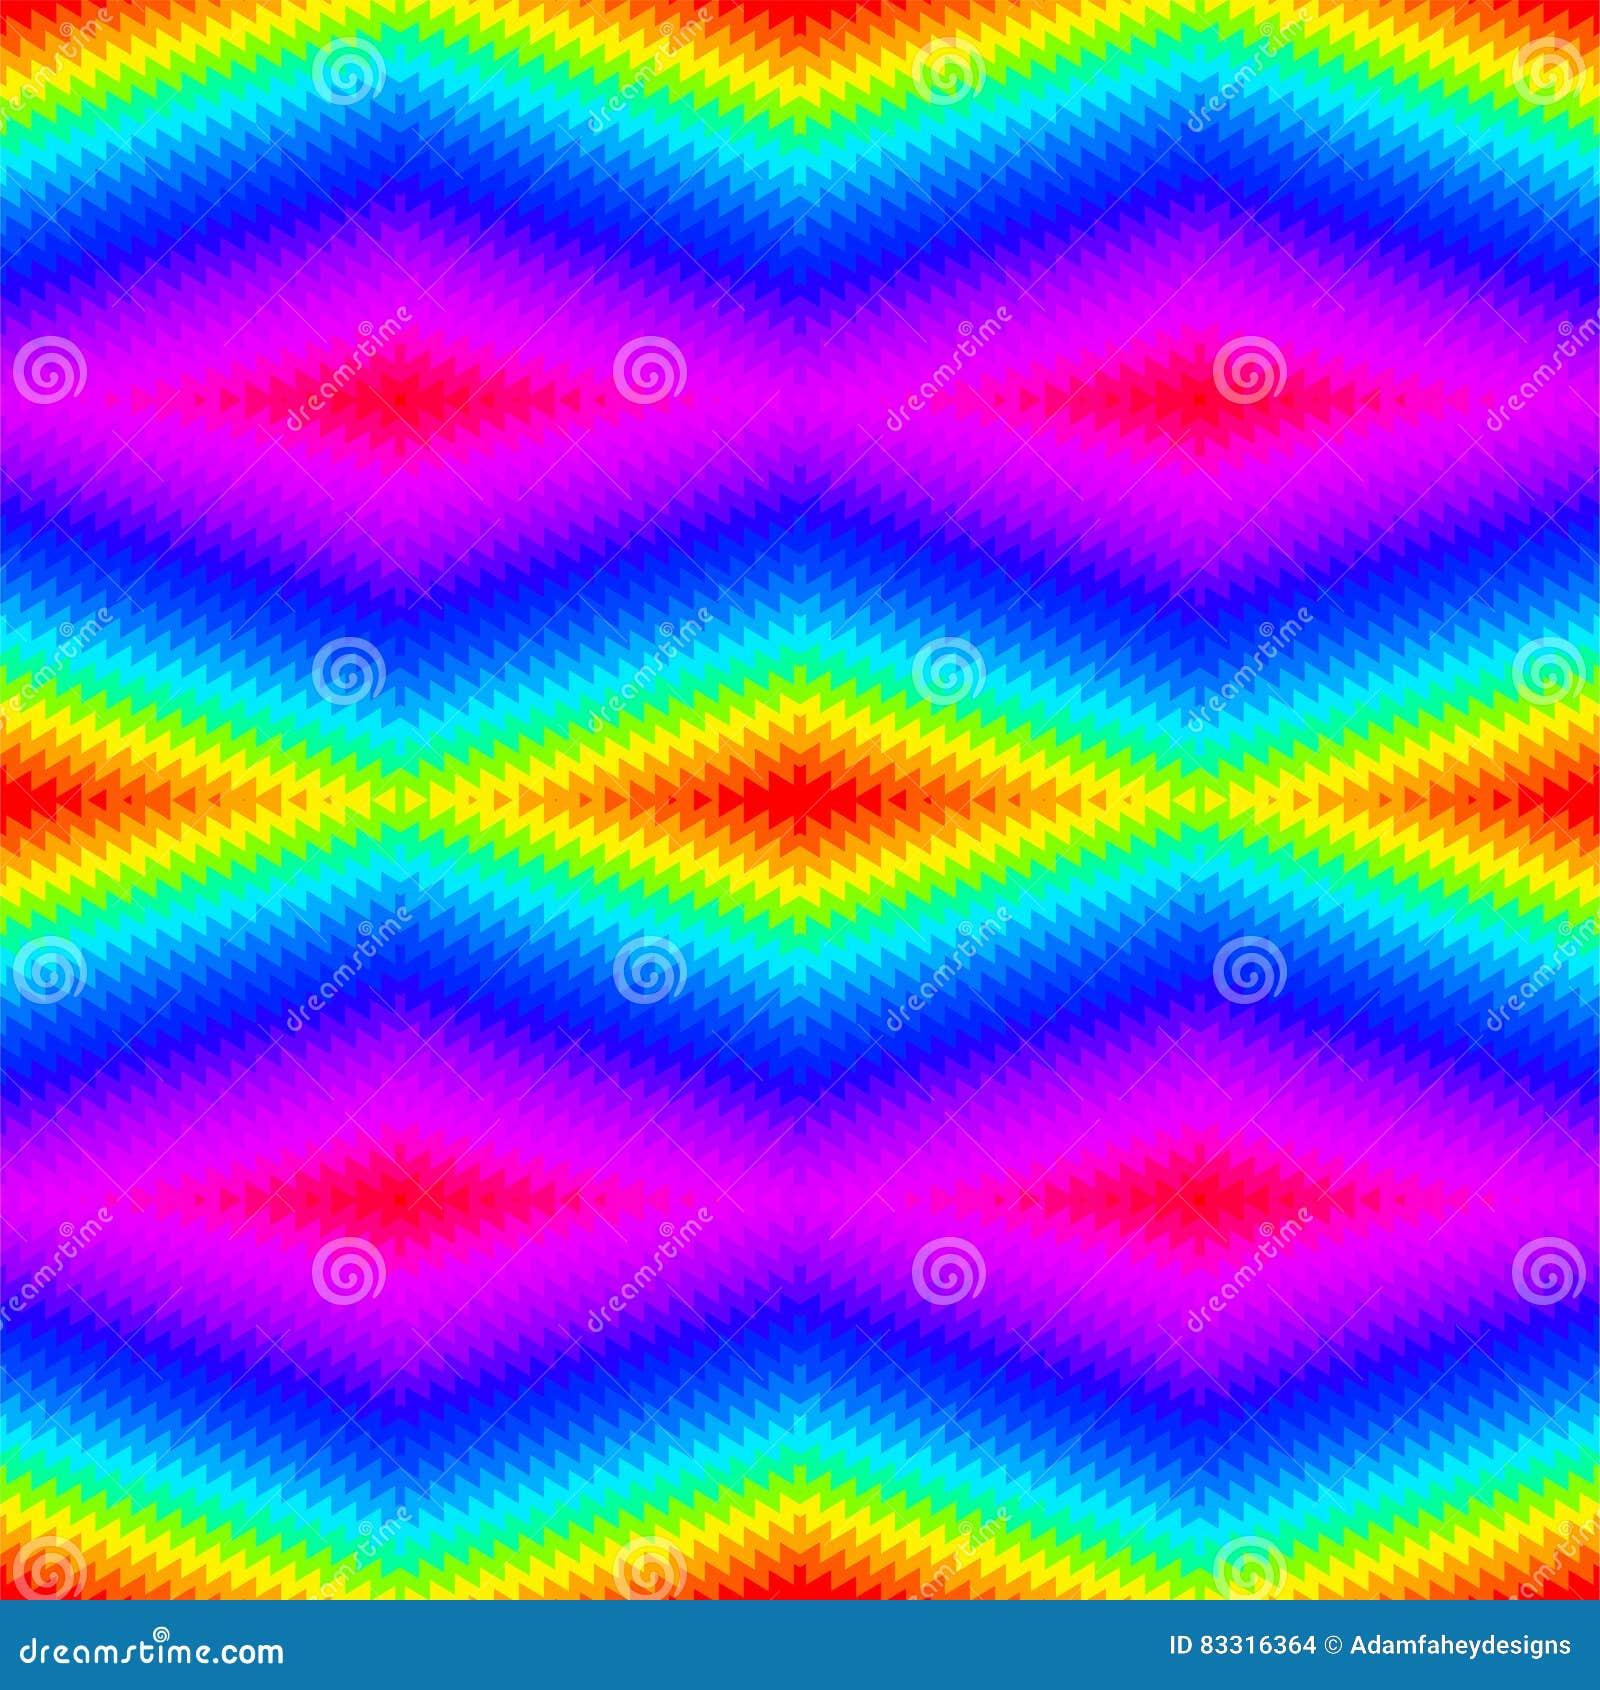 seamless repeating tie dye - photo #13